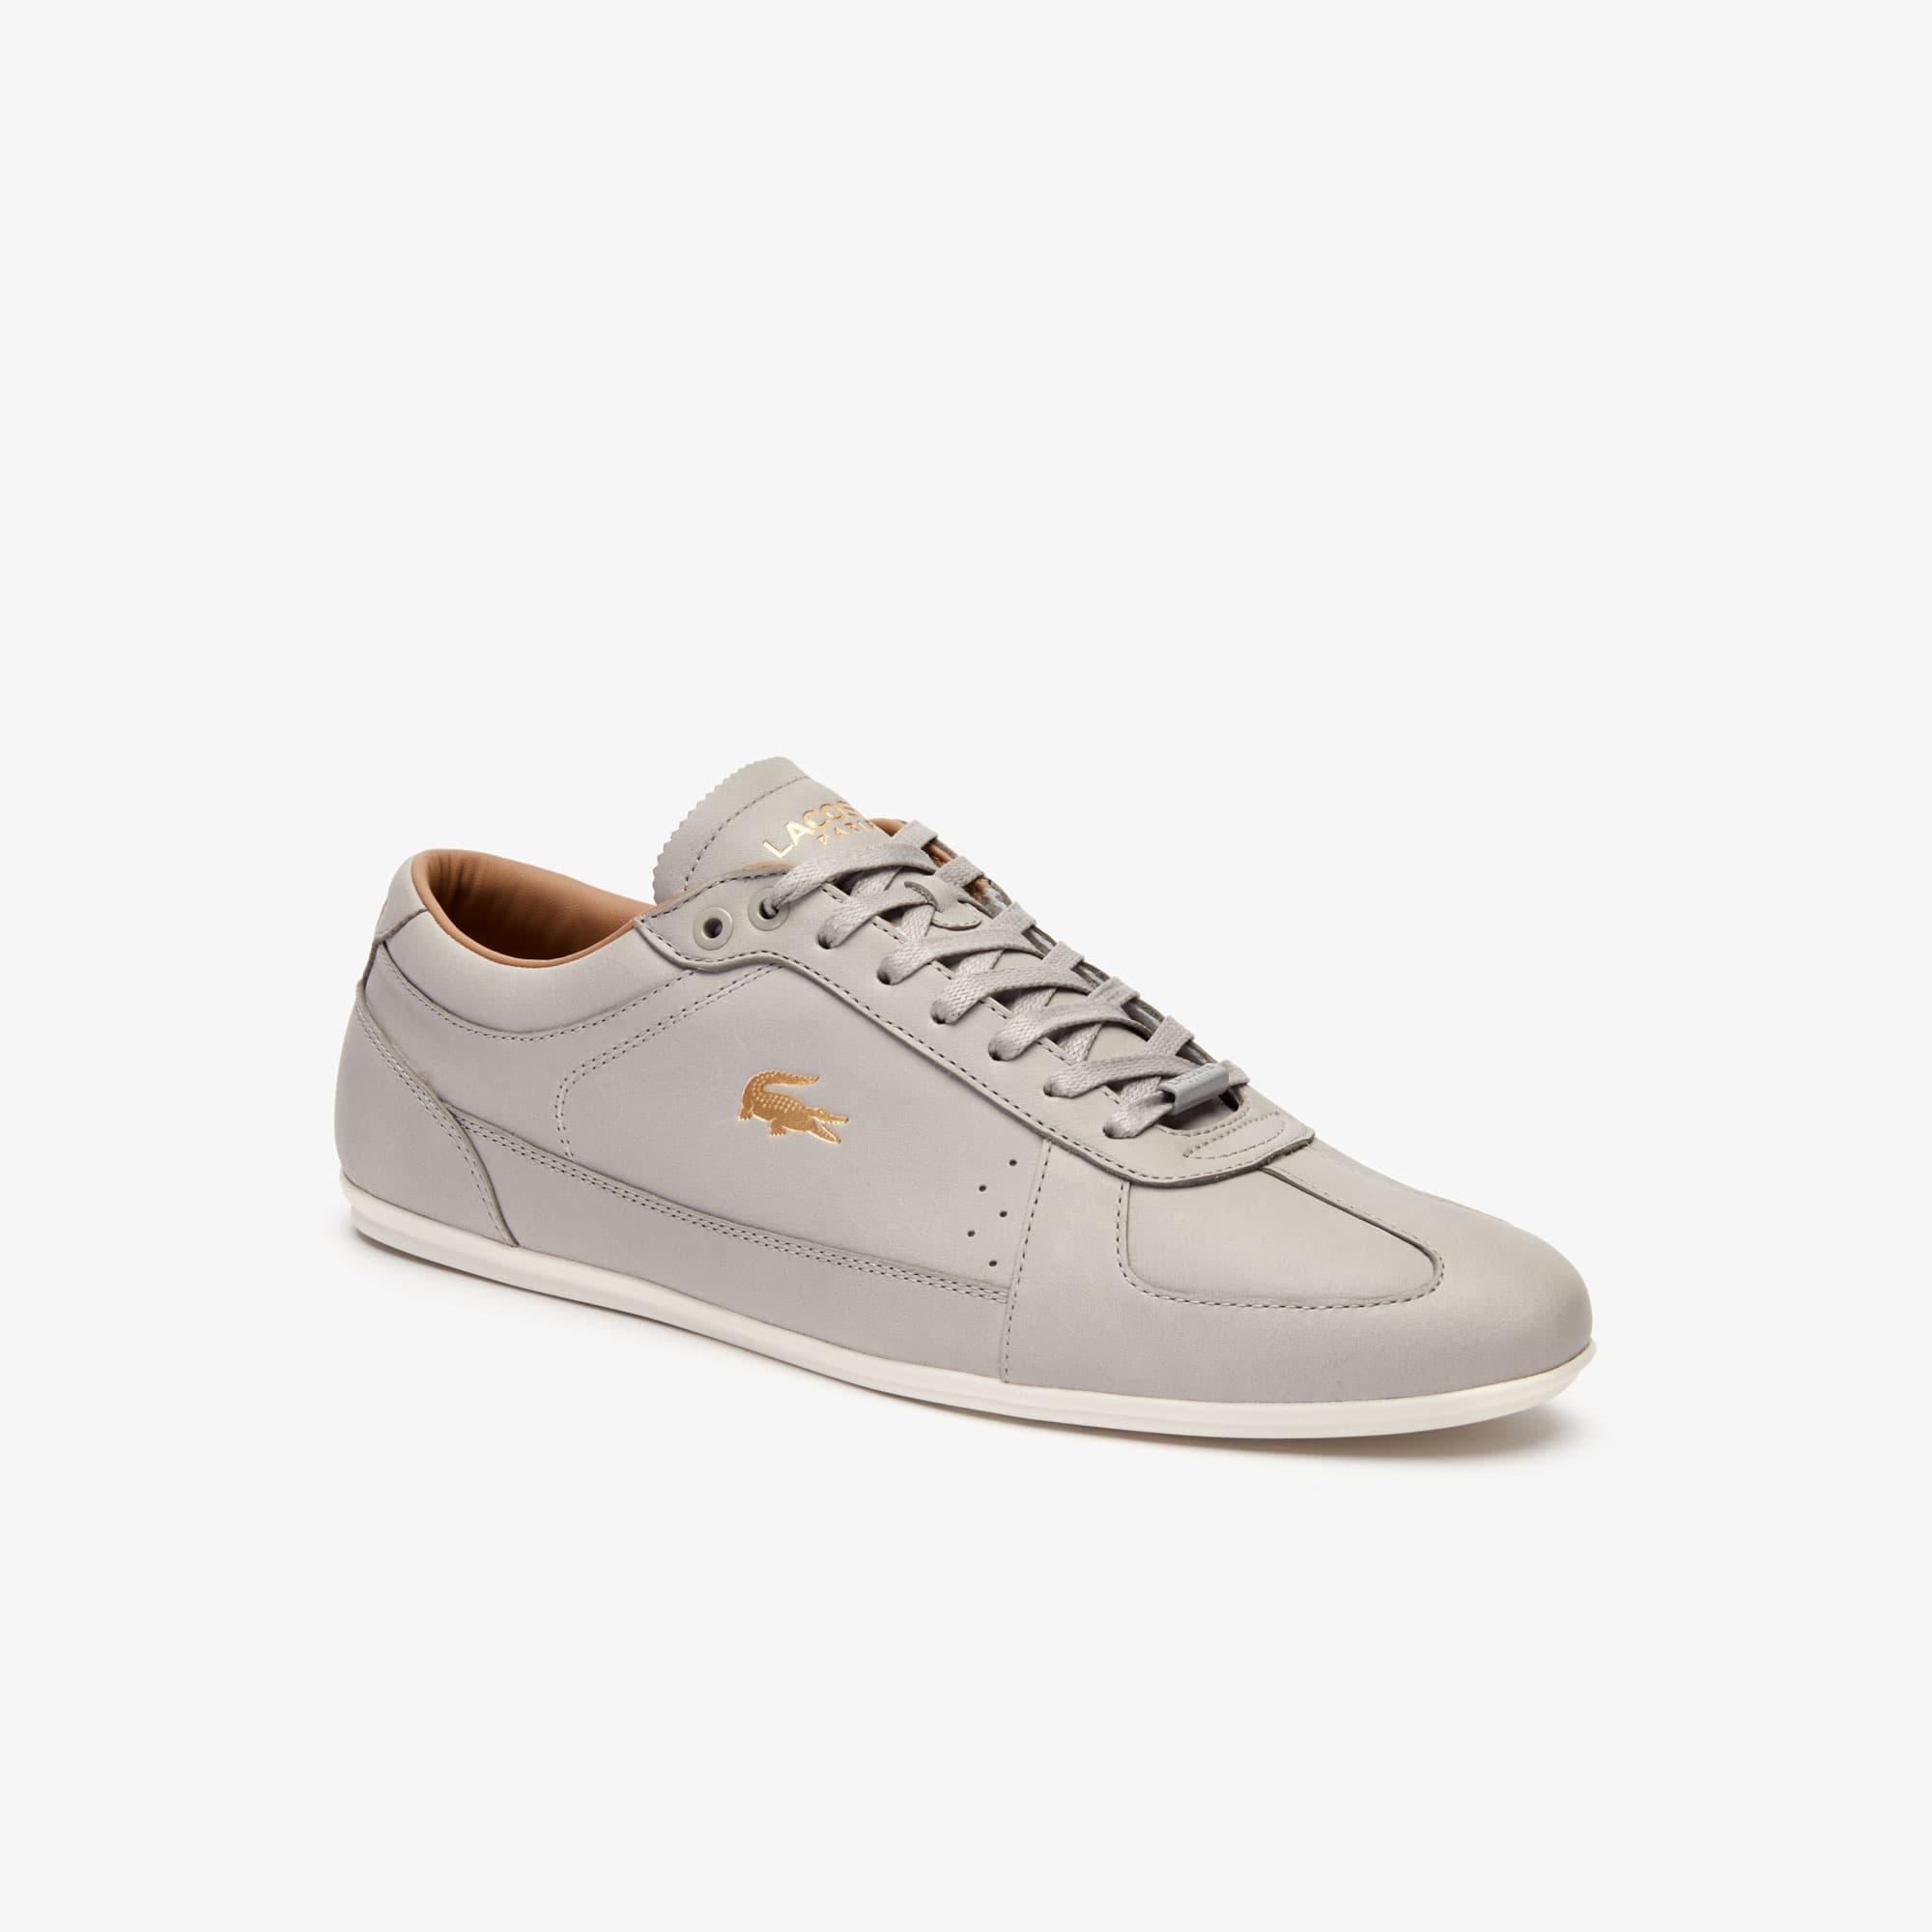 Lacoste Men's Evara Leather Sneakers In